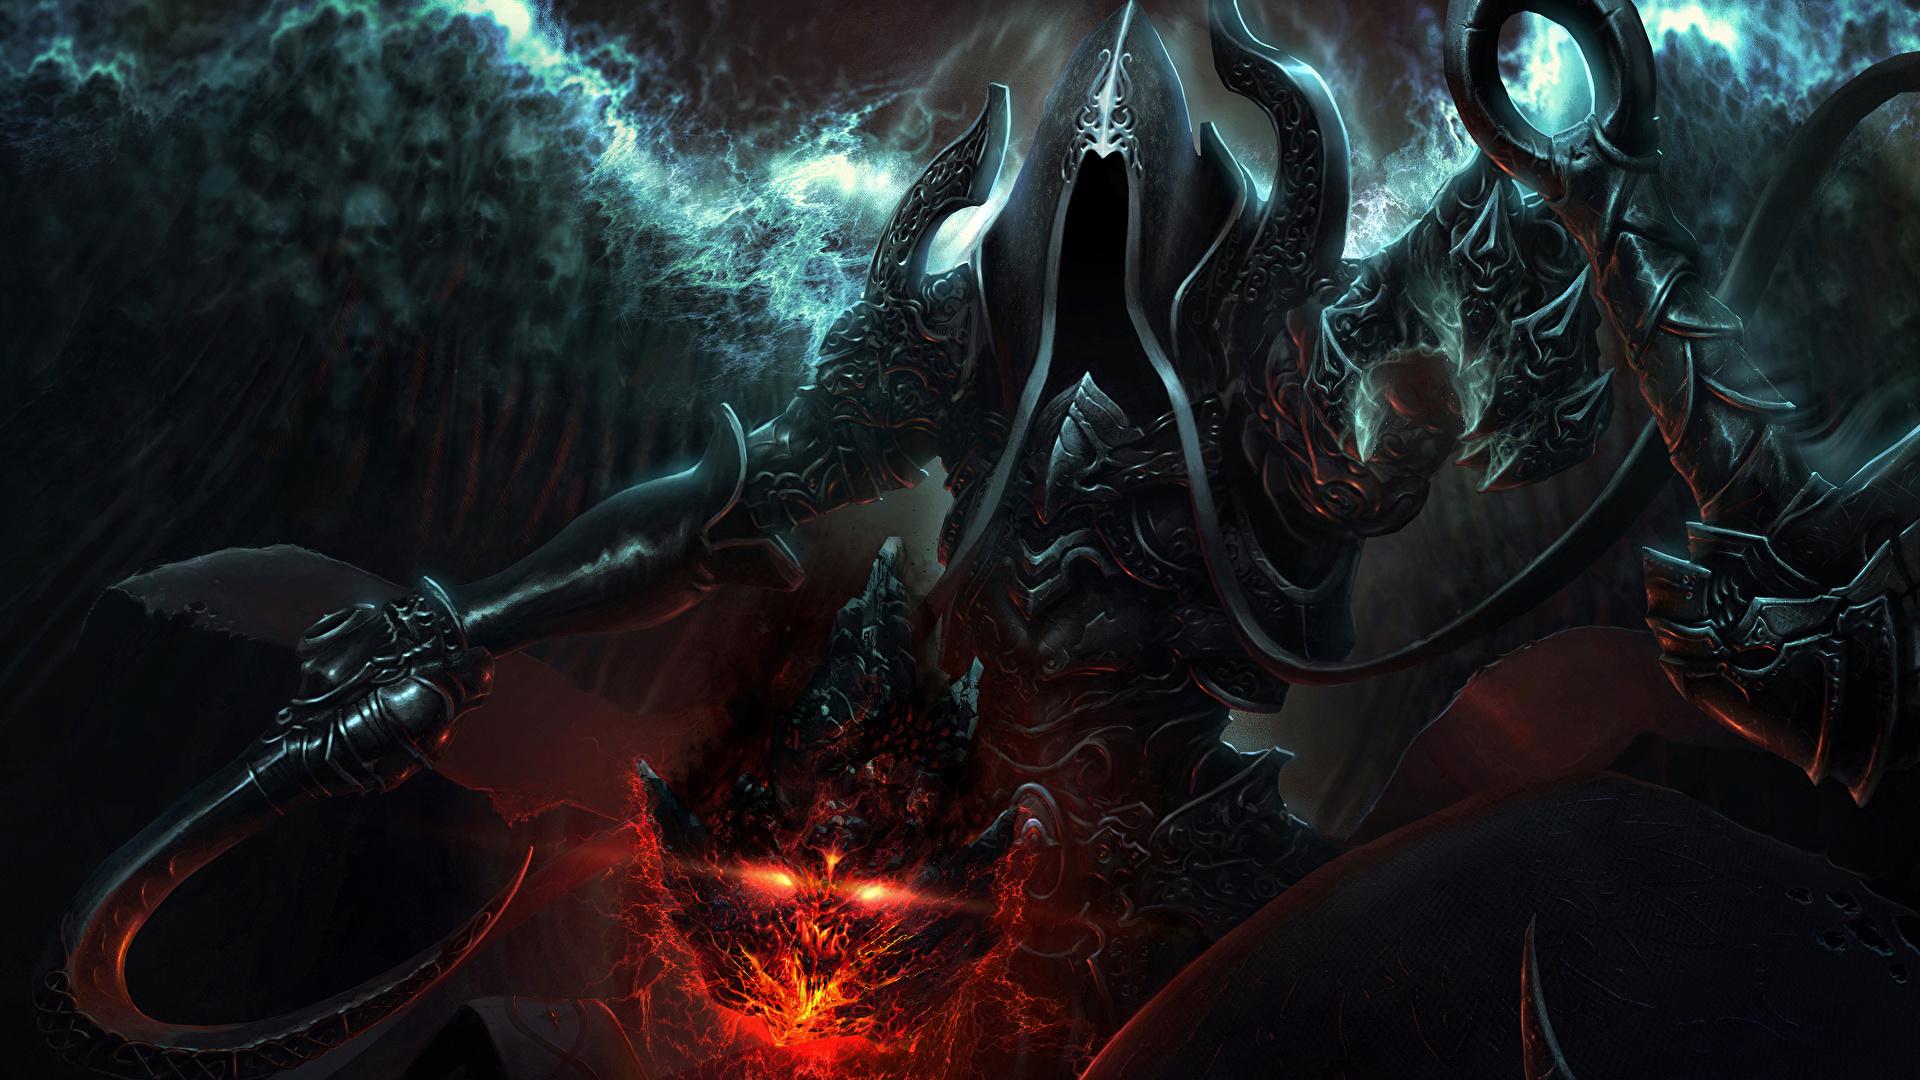 Image Diablo 3 Warrior Malthael Reaper Of Souls Fantasy 1920x1080